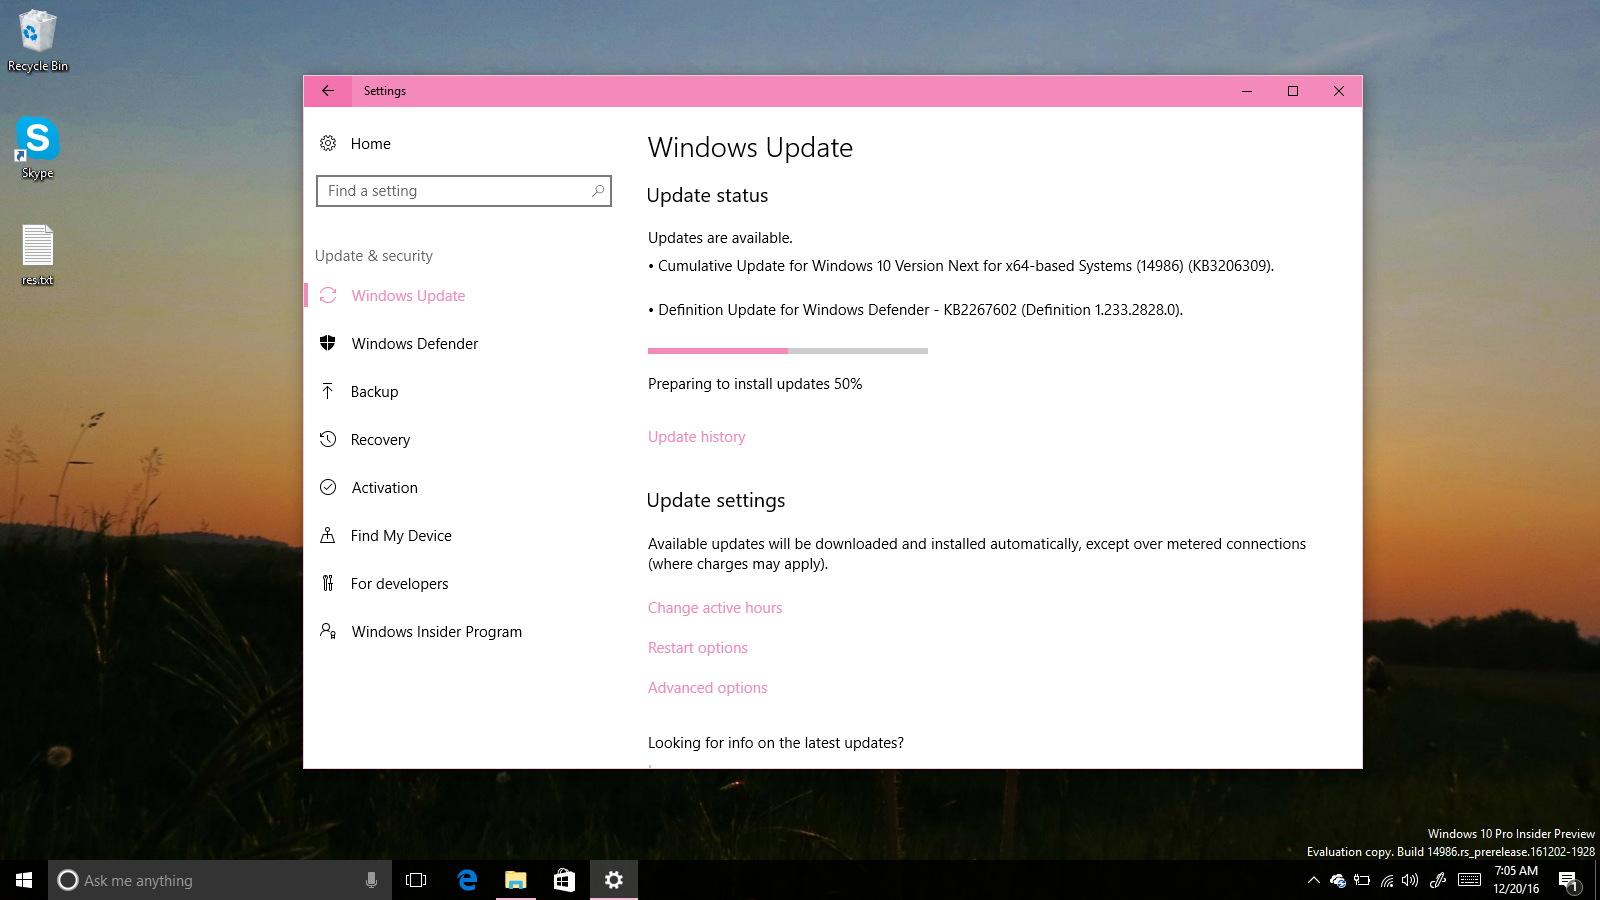 KB3206309 for Windows 10 Creators Update